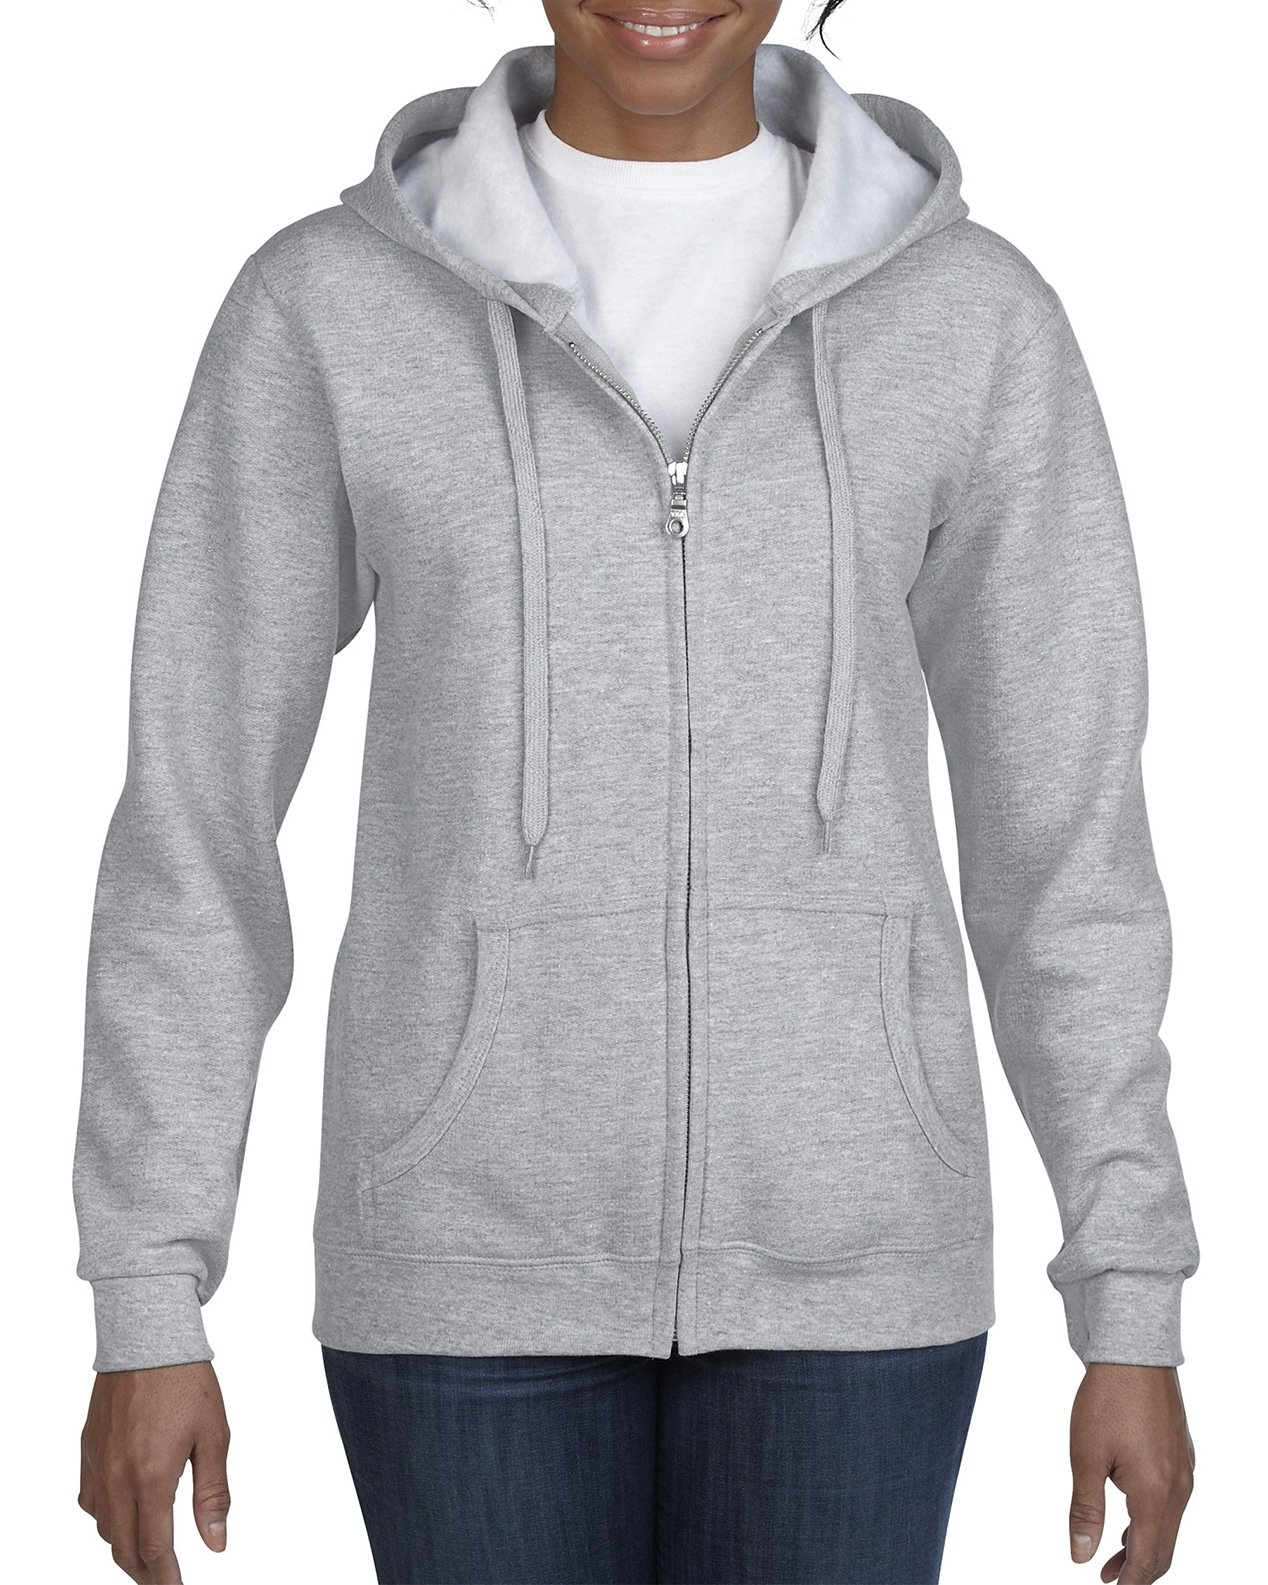 Gildan Women's Full Zip Hooded Sweatshirt, Sport Grey, Medium